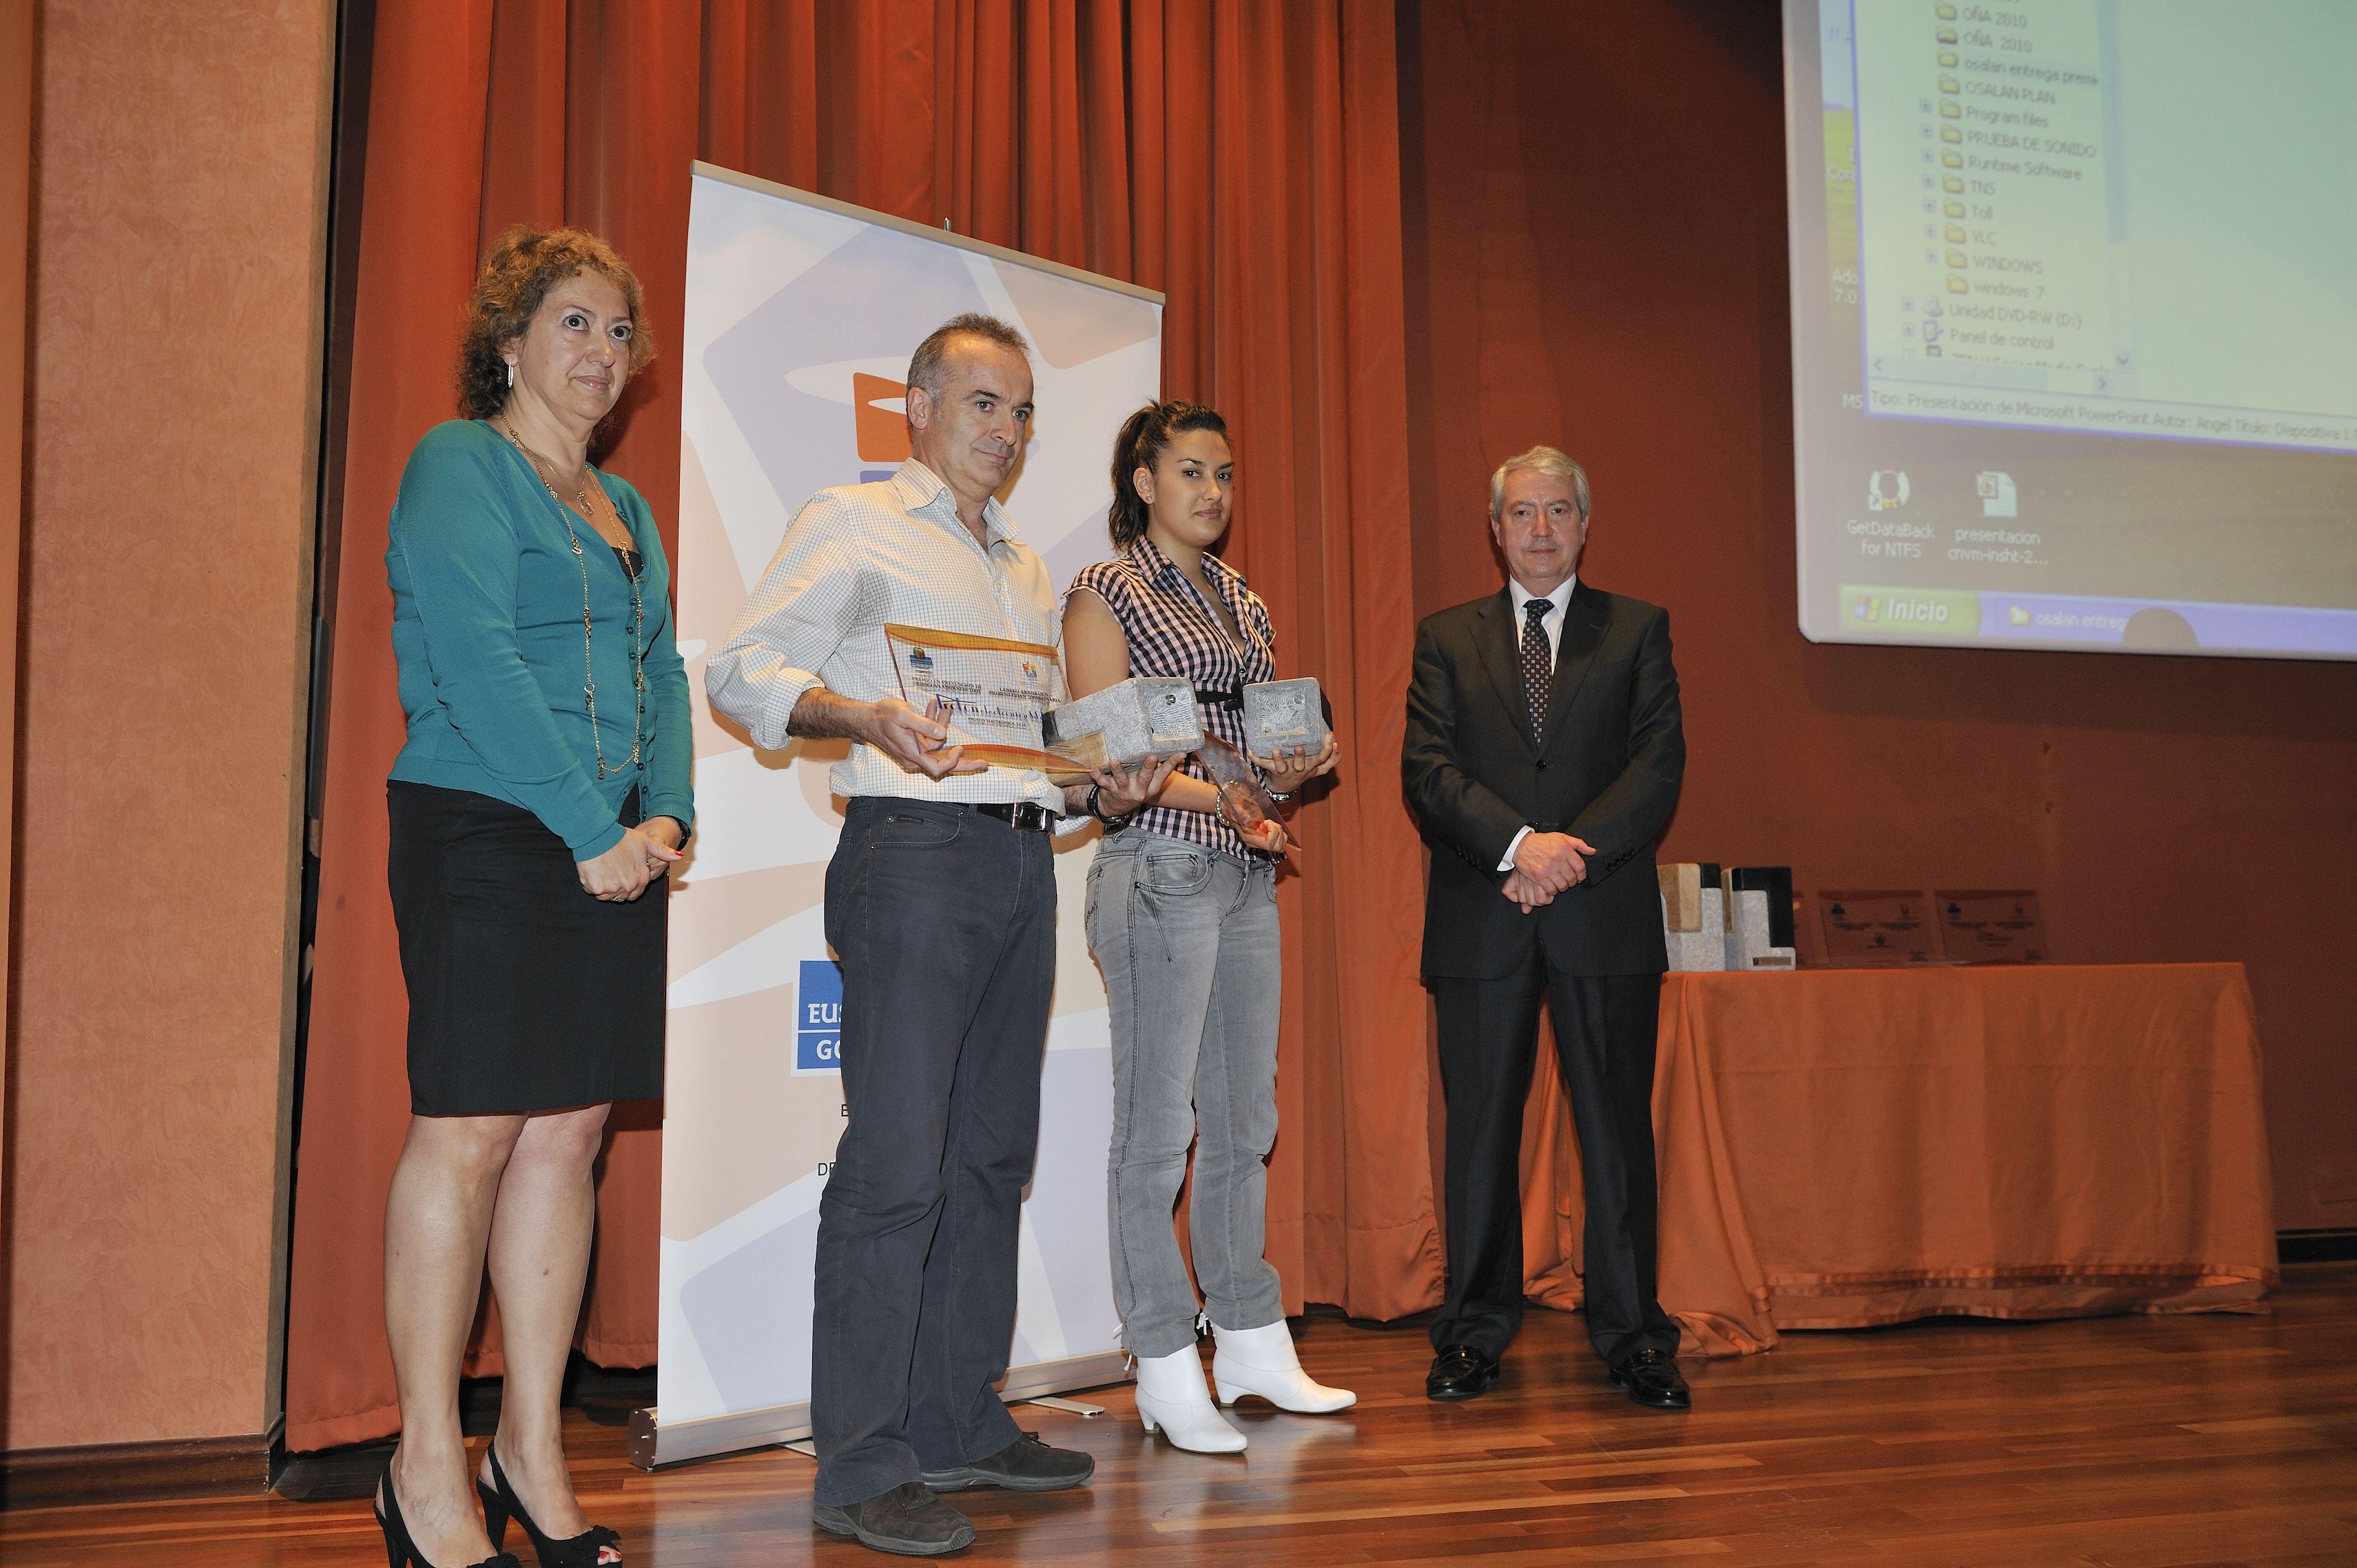 premios_osalan5.jpg